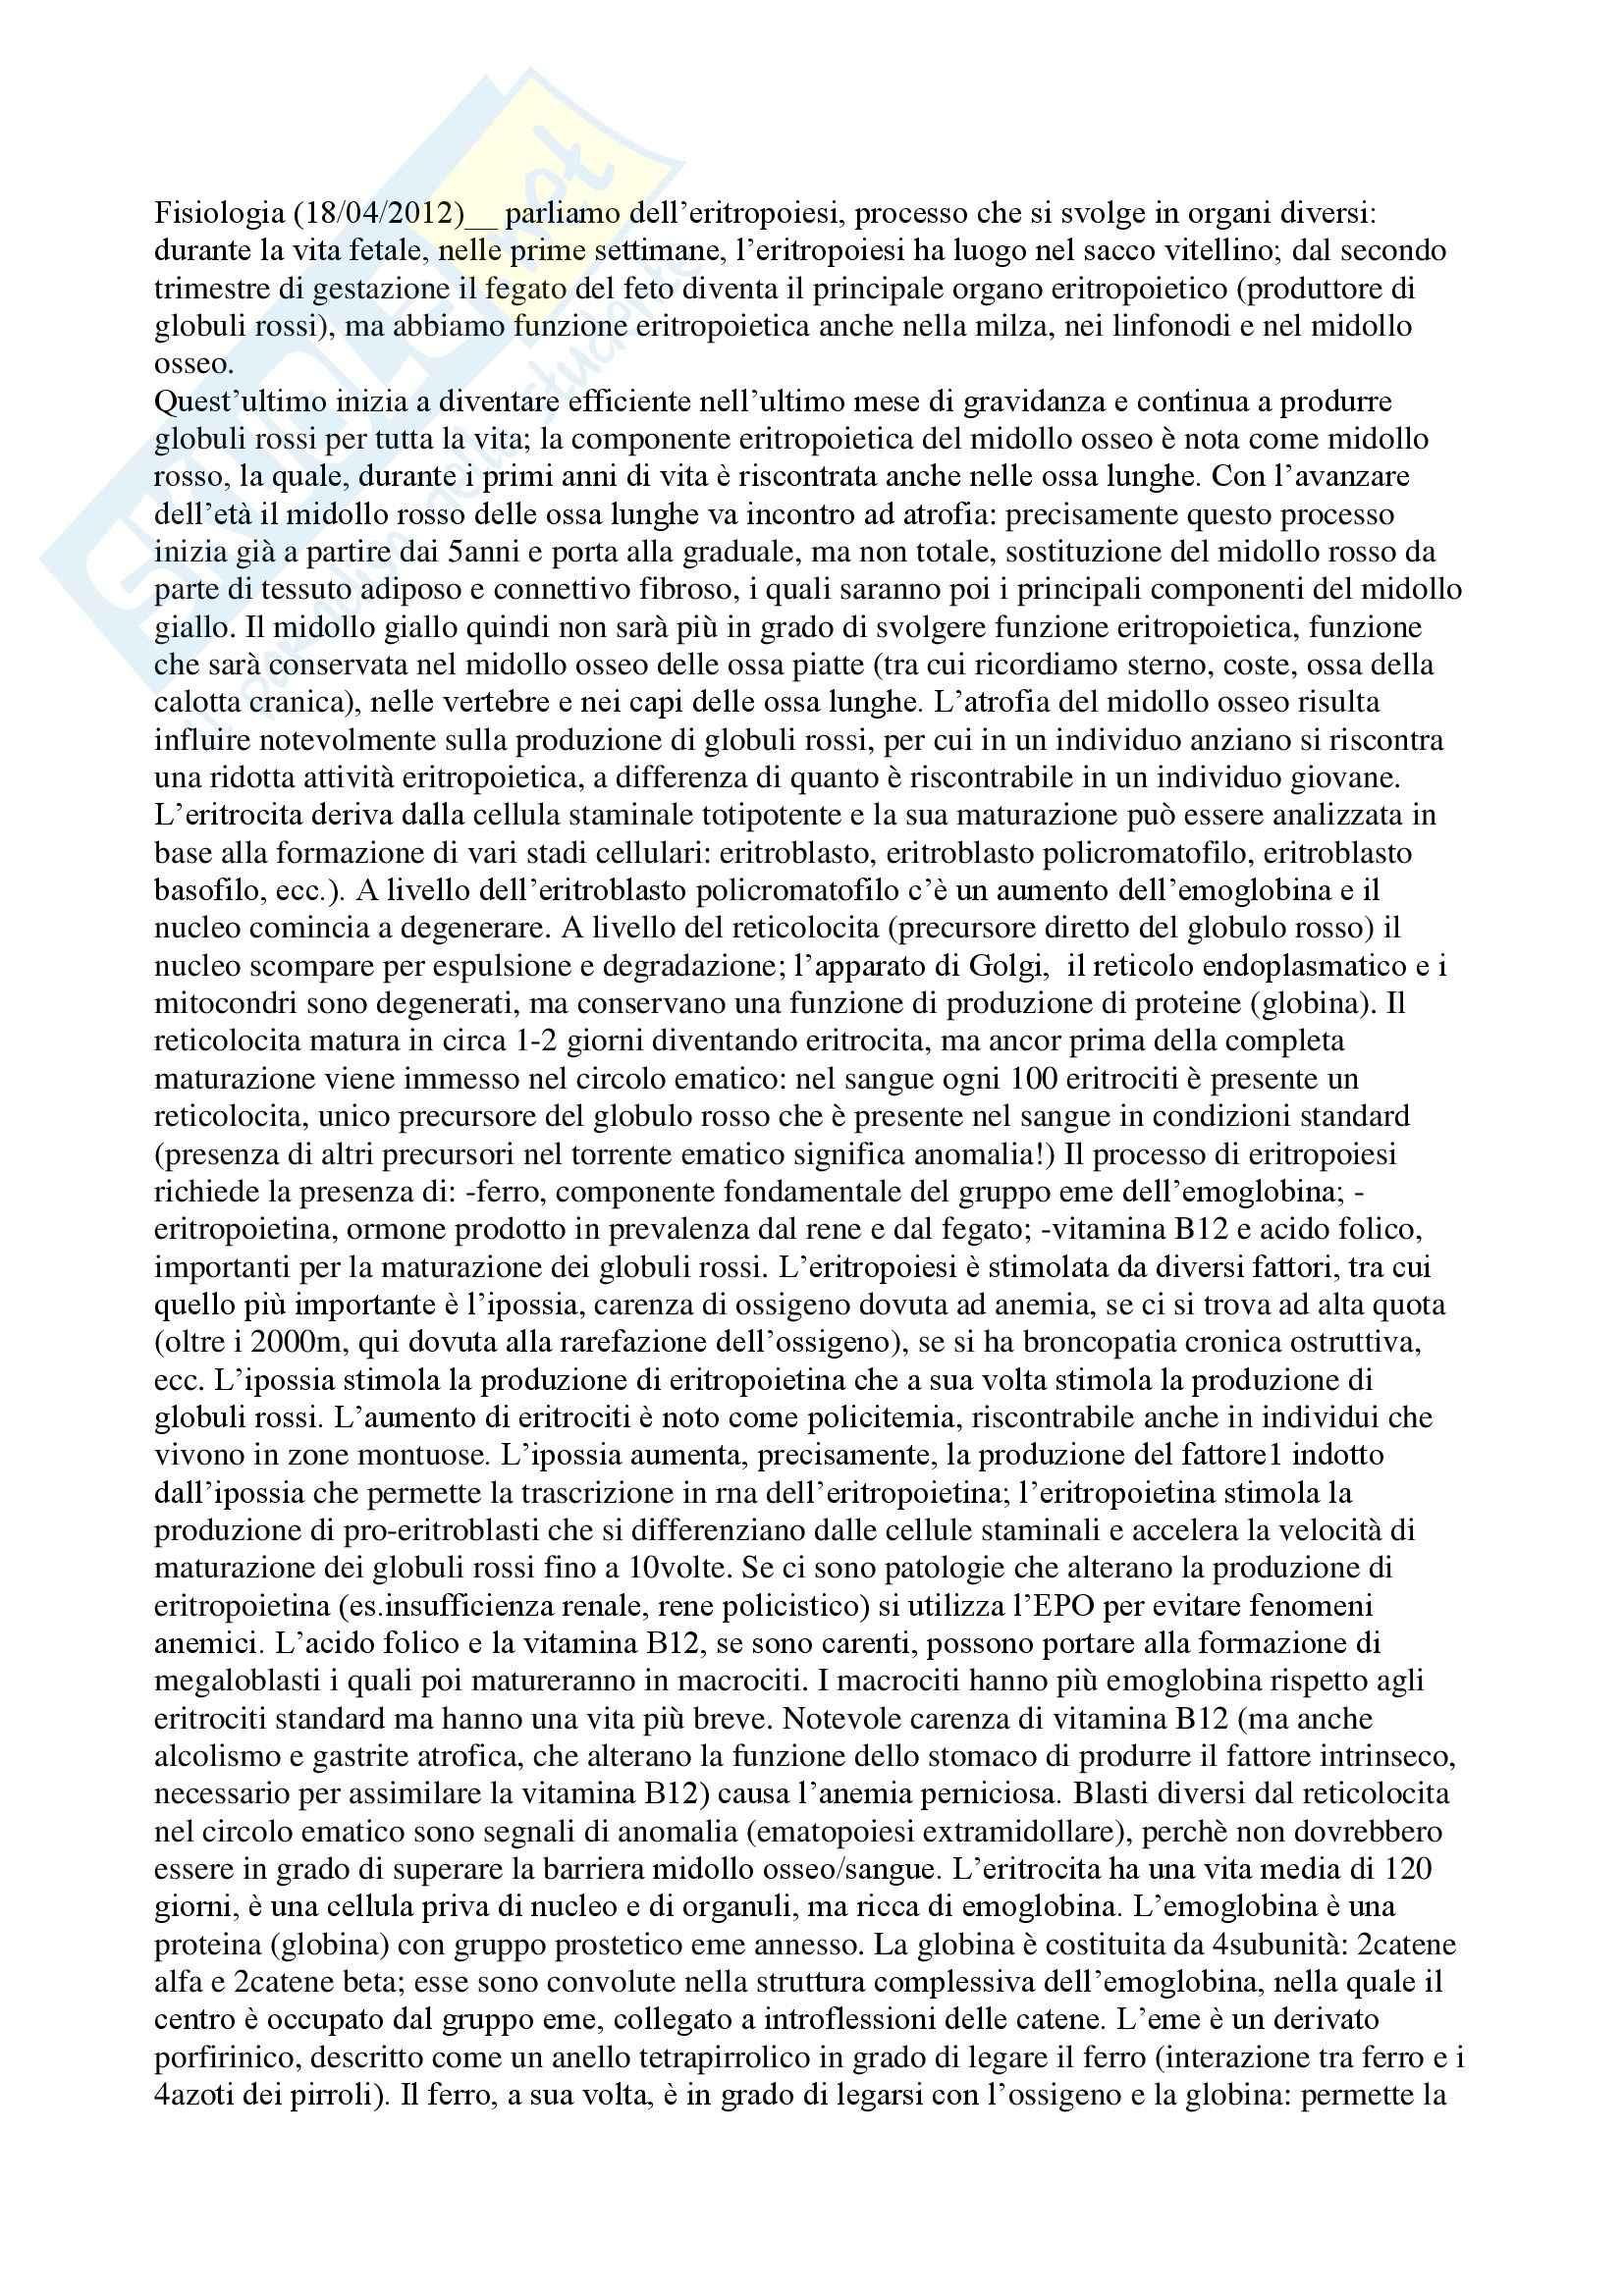 Fisiologia umana I - eritropoiesi